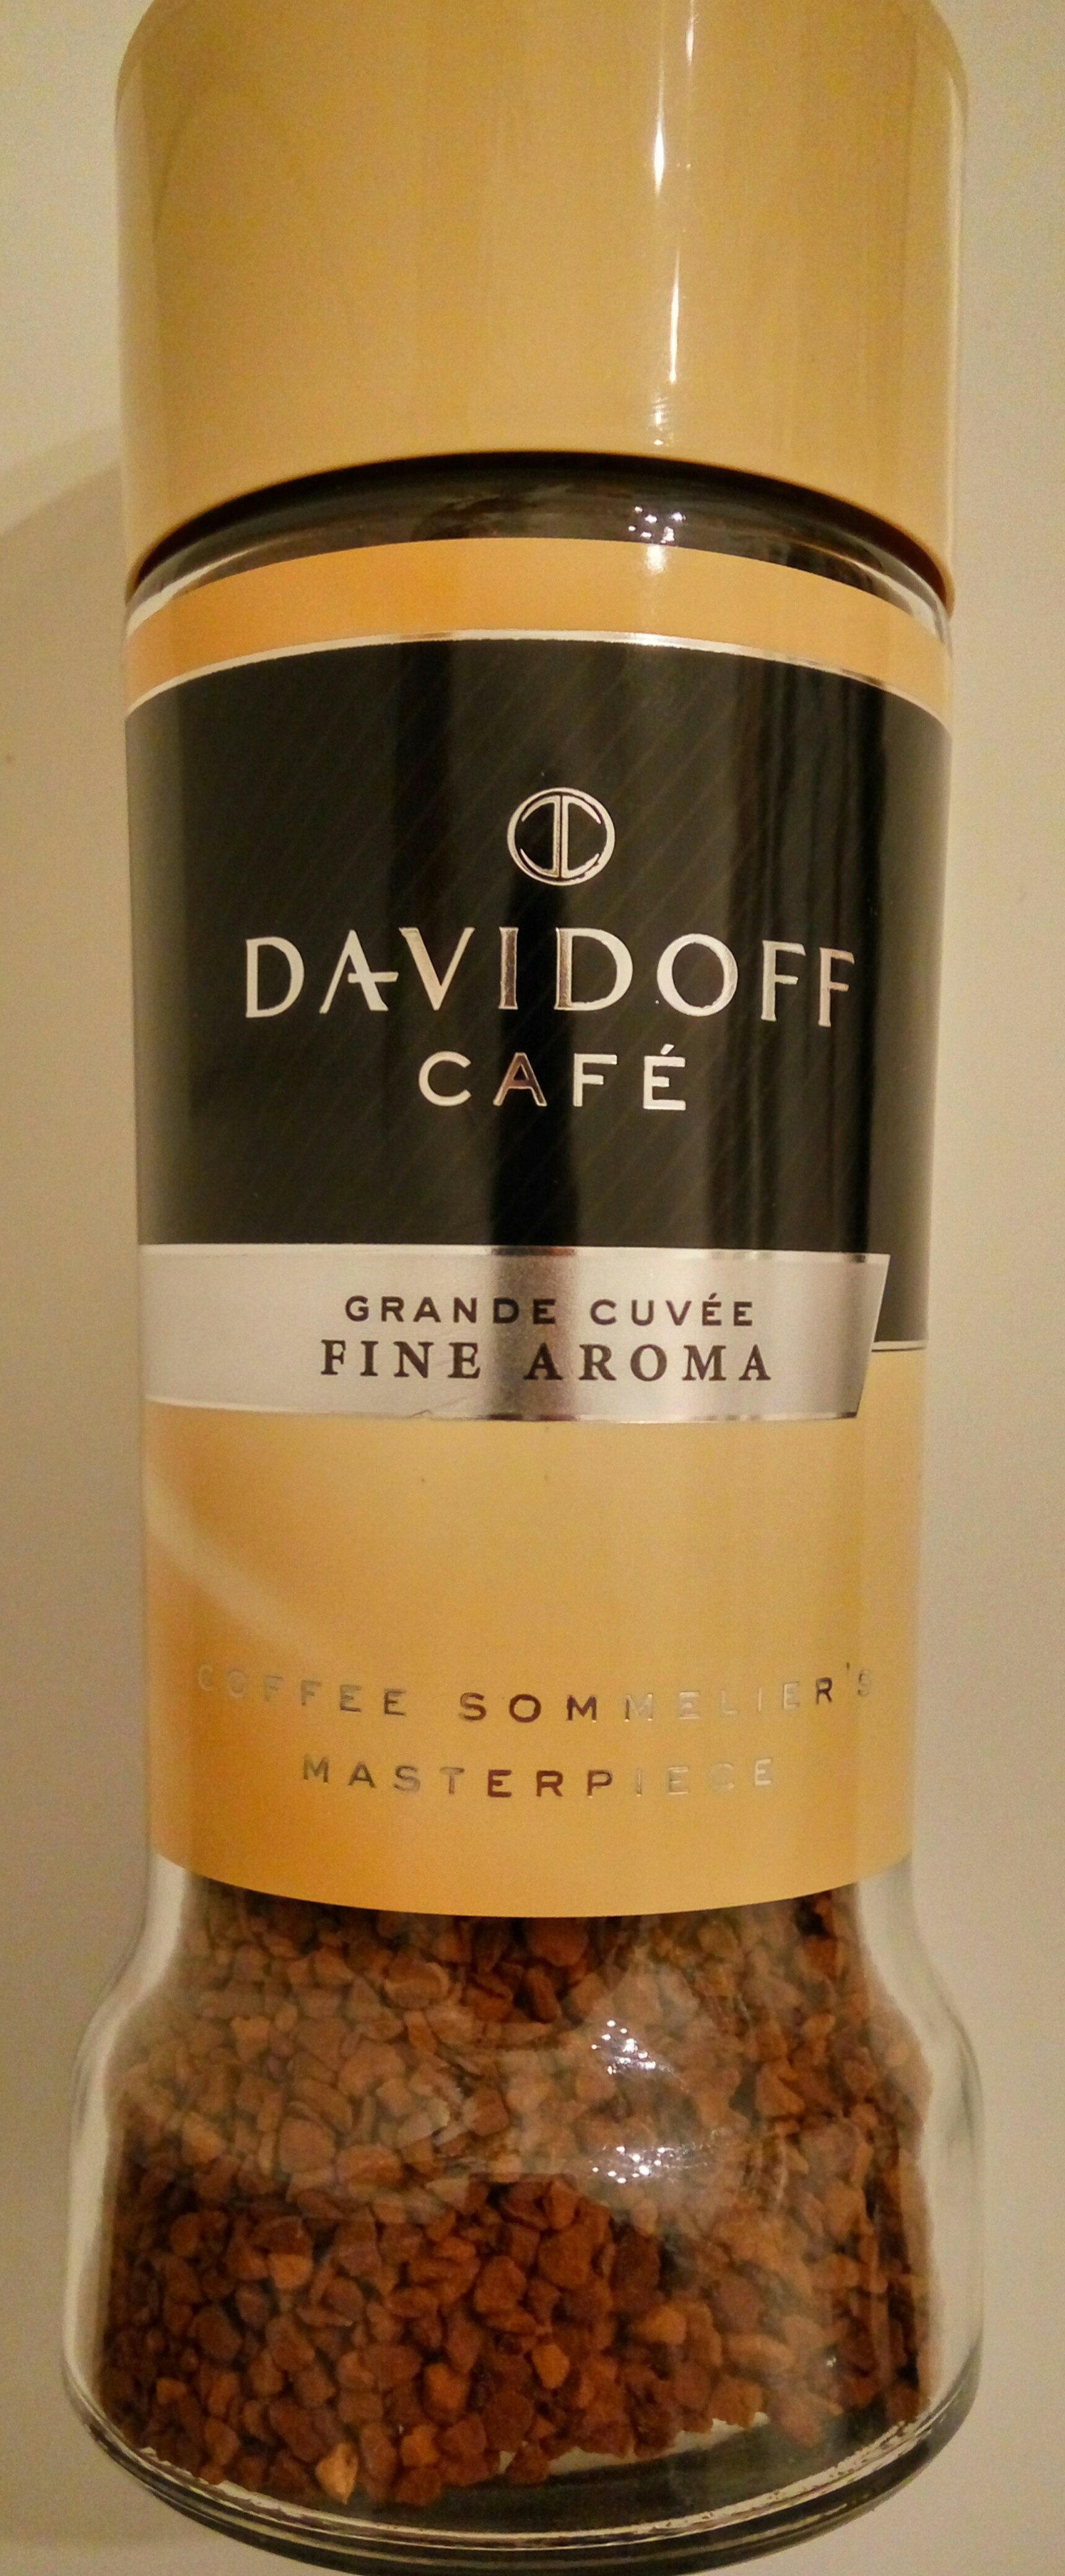 Davidoff Café Grand Cuvée Fine Aroma - Produit - hu